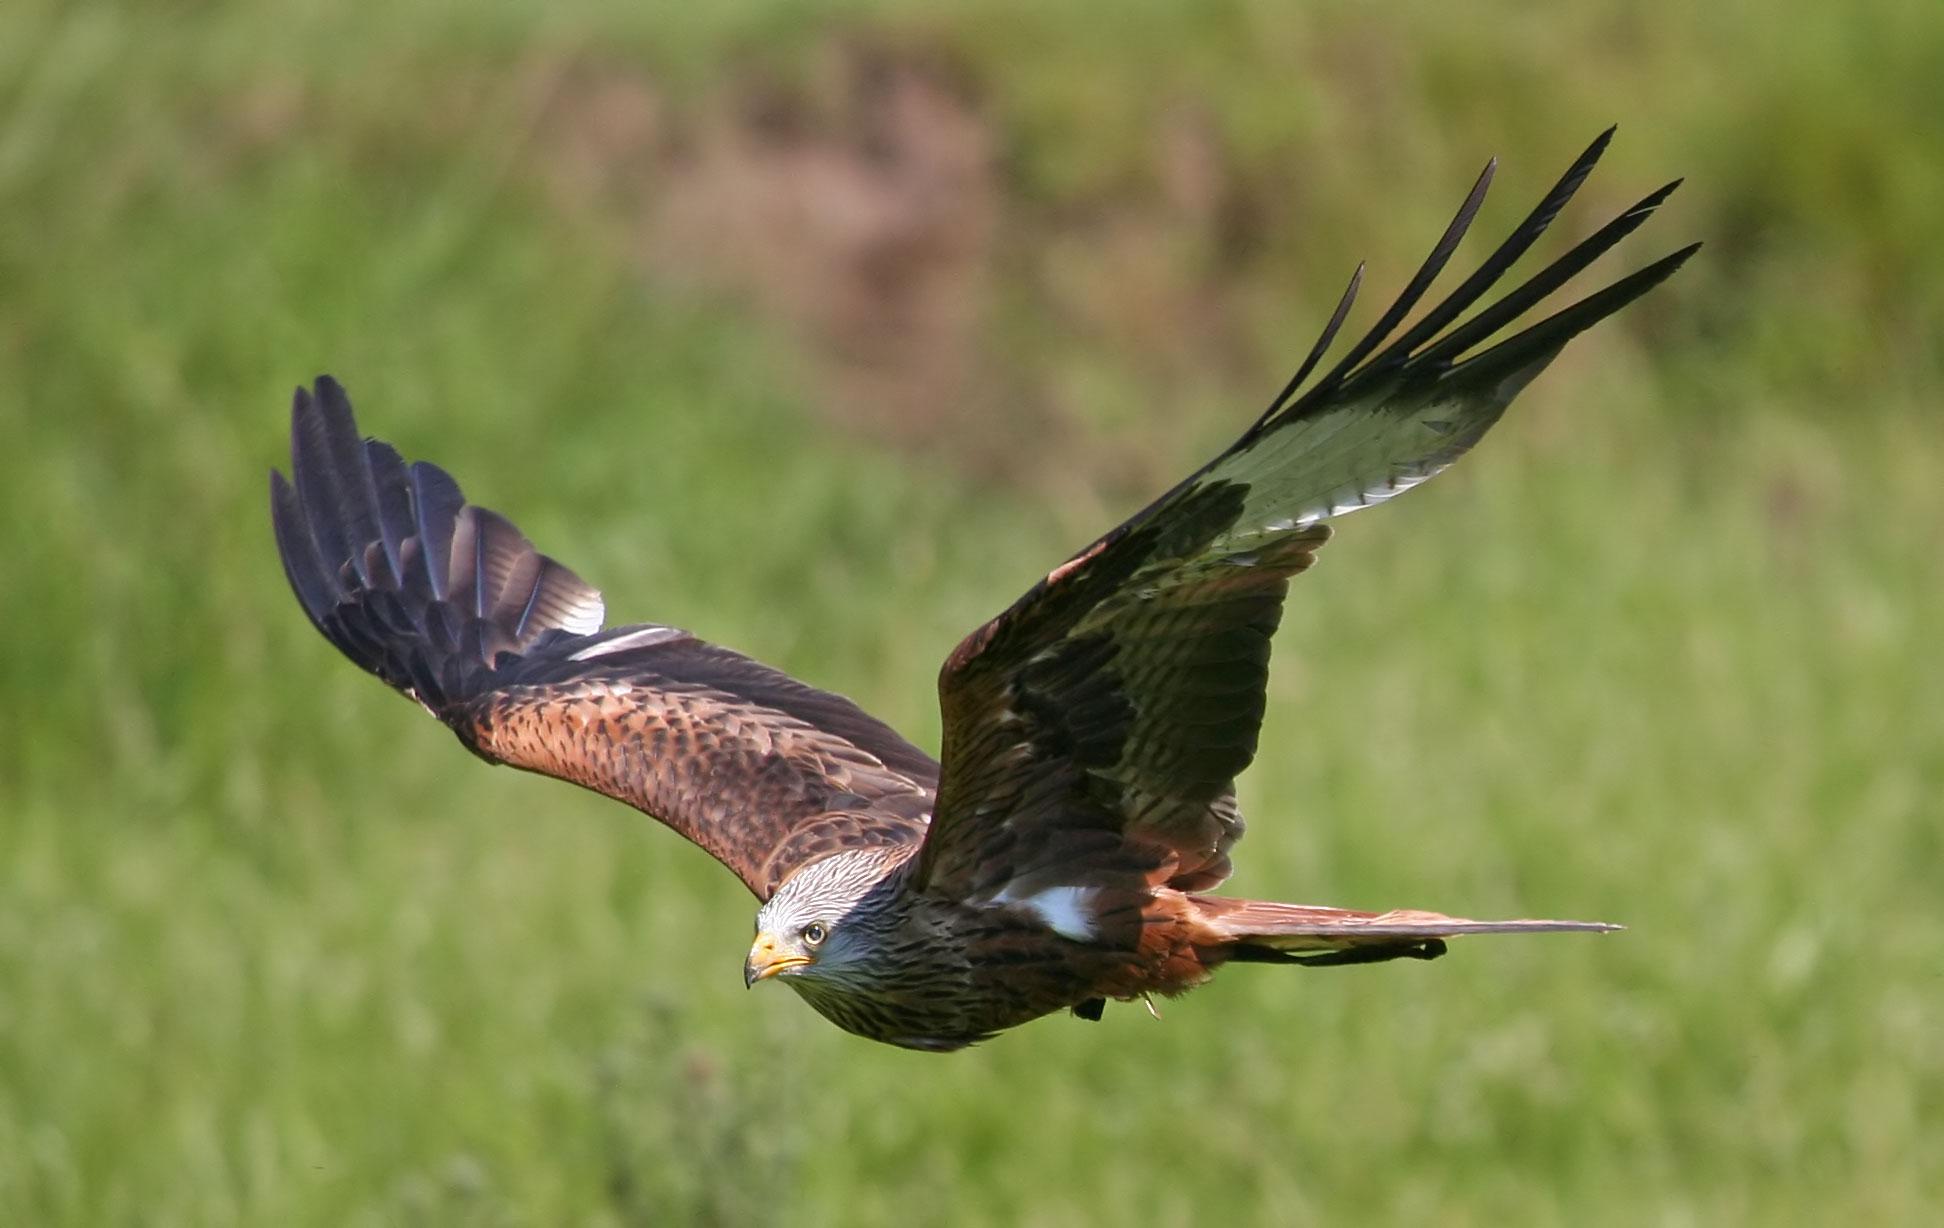 Flying_Falcon